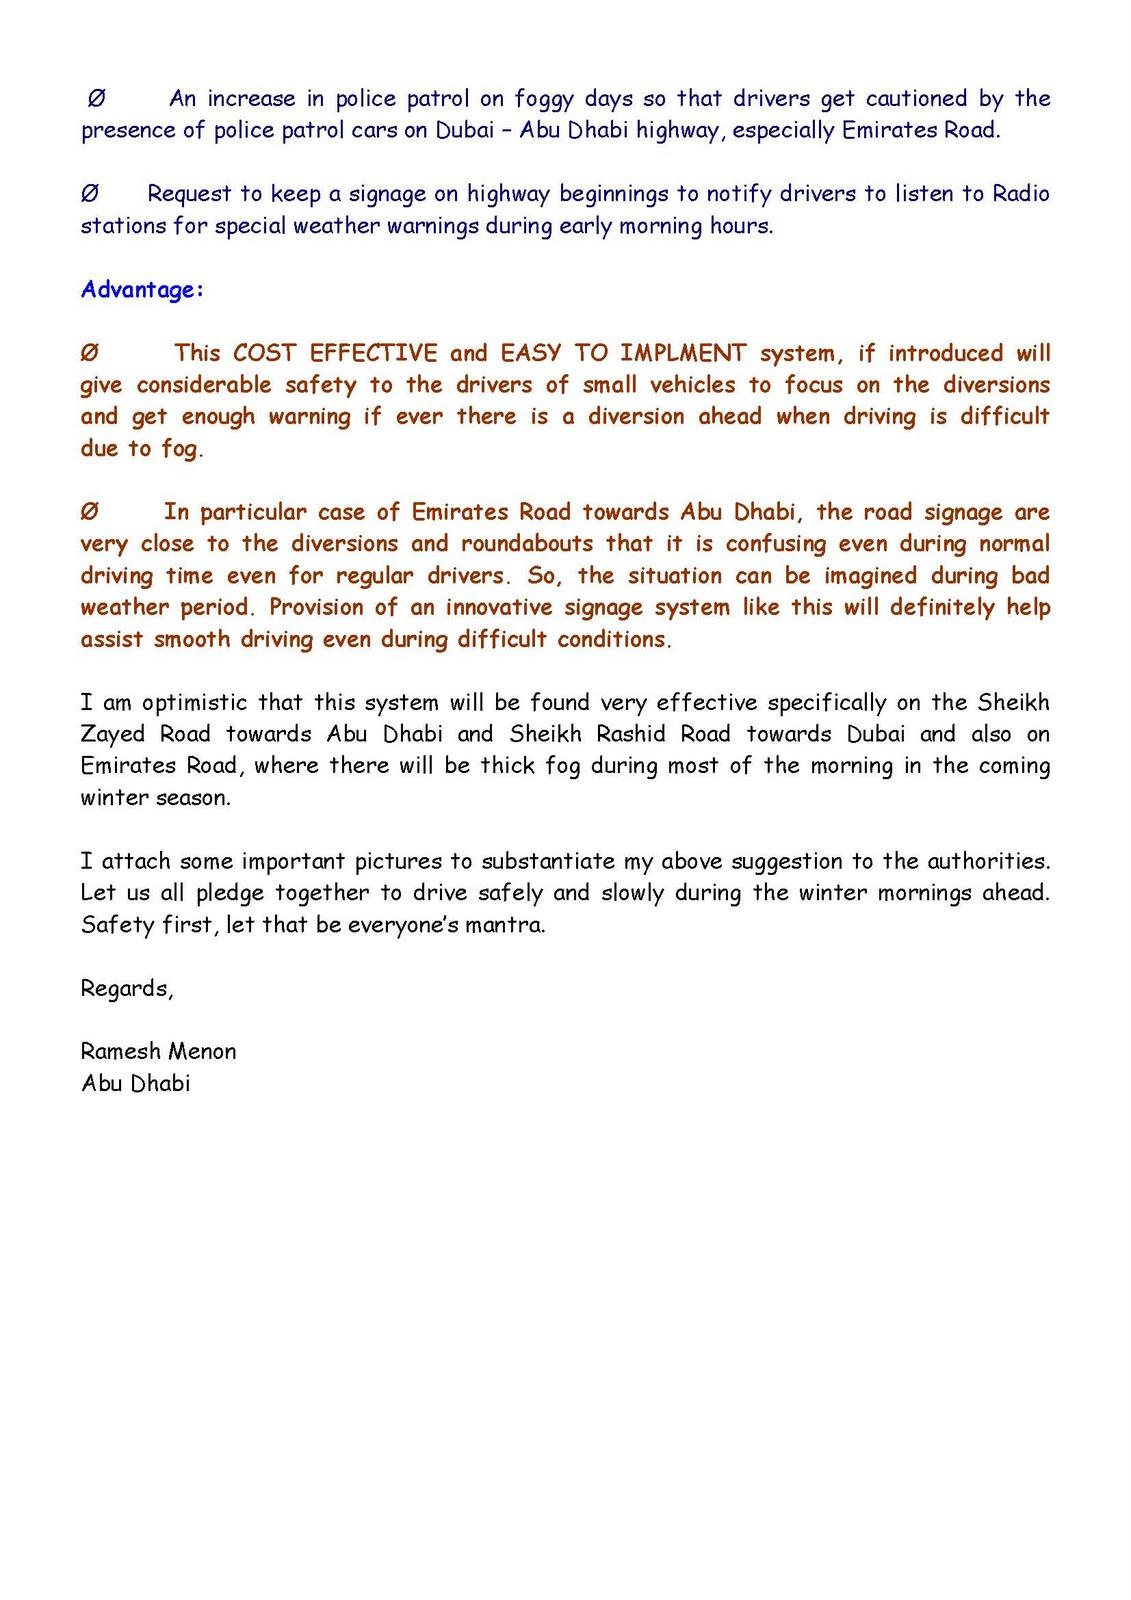 dt as91632 report Annual general meeting 2018 deutsche telekom ag details may 24, 2018 capital markets day 2018 deutsche telekom ag details aug 09, 2018 results for the second quarter 2018 interim report as of june 30, 2018 details nov 08, 2018 results for the third quarter 2018 interim report as of september 30, 2018.